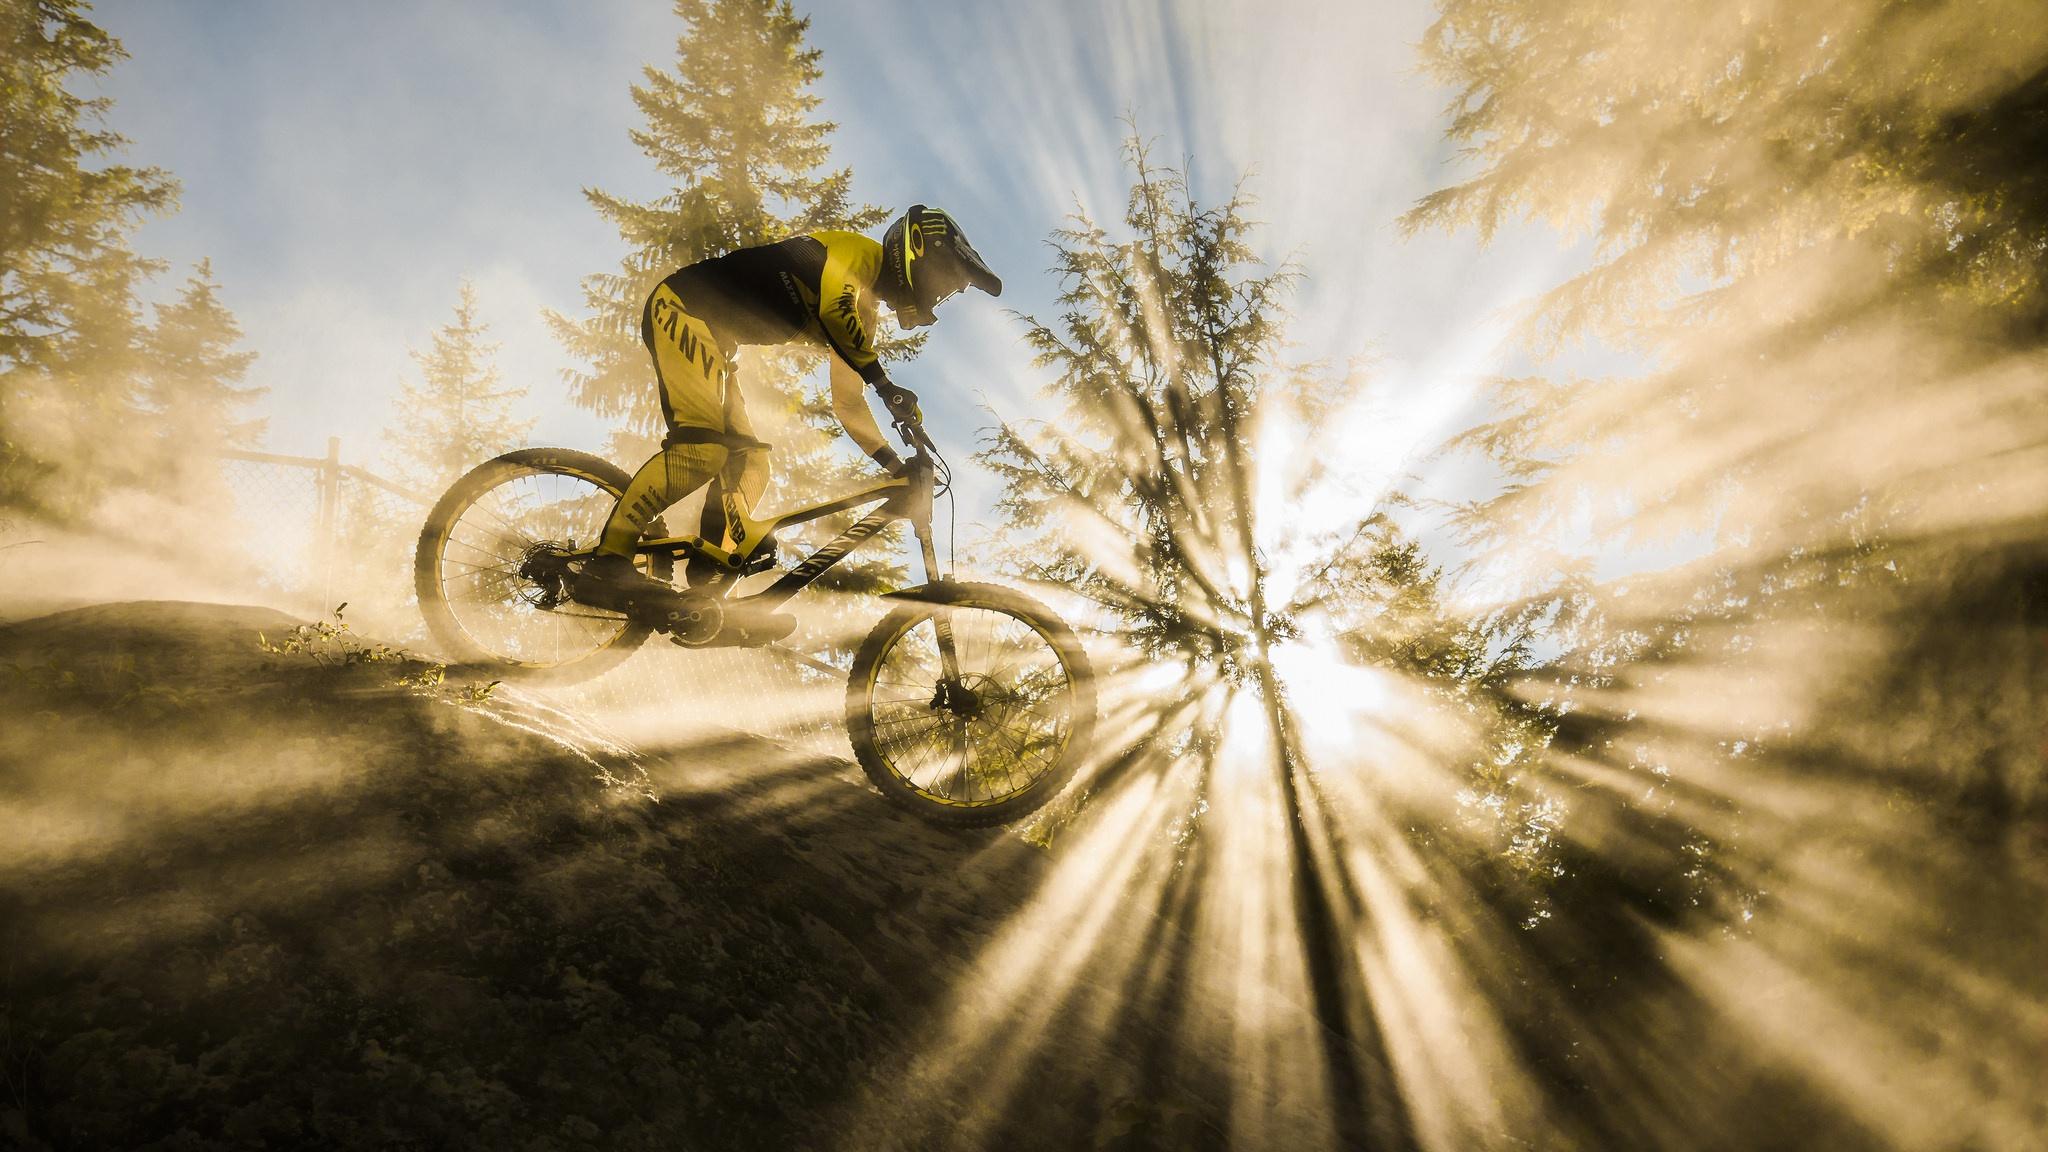 1366x768 Mountain Bike Sunbeam 1366x768 Resolution Hd 4k